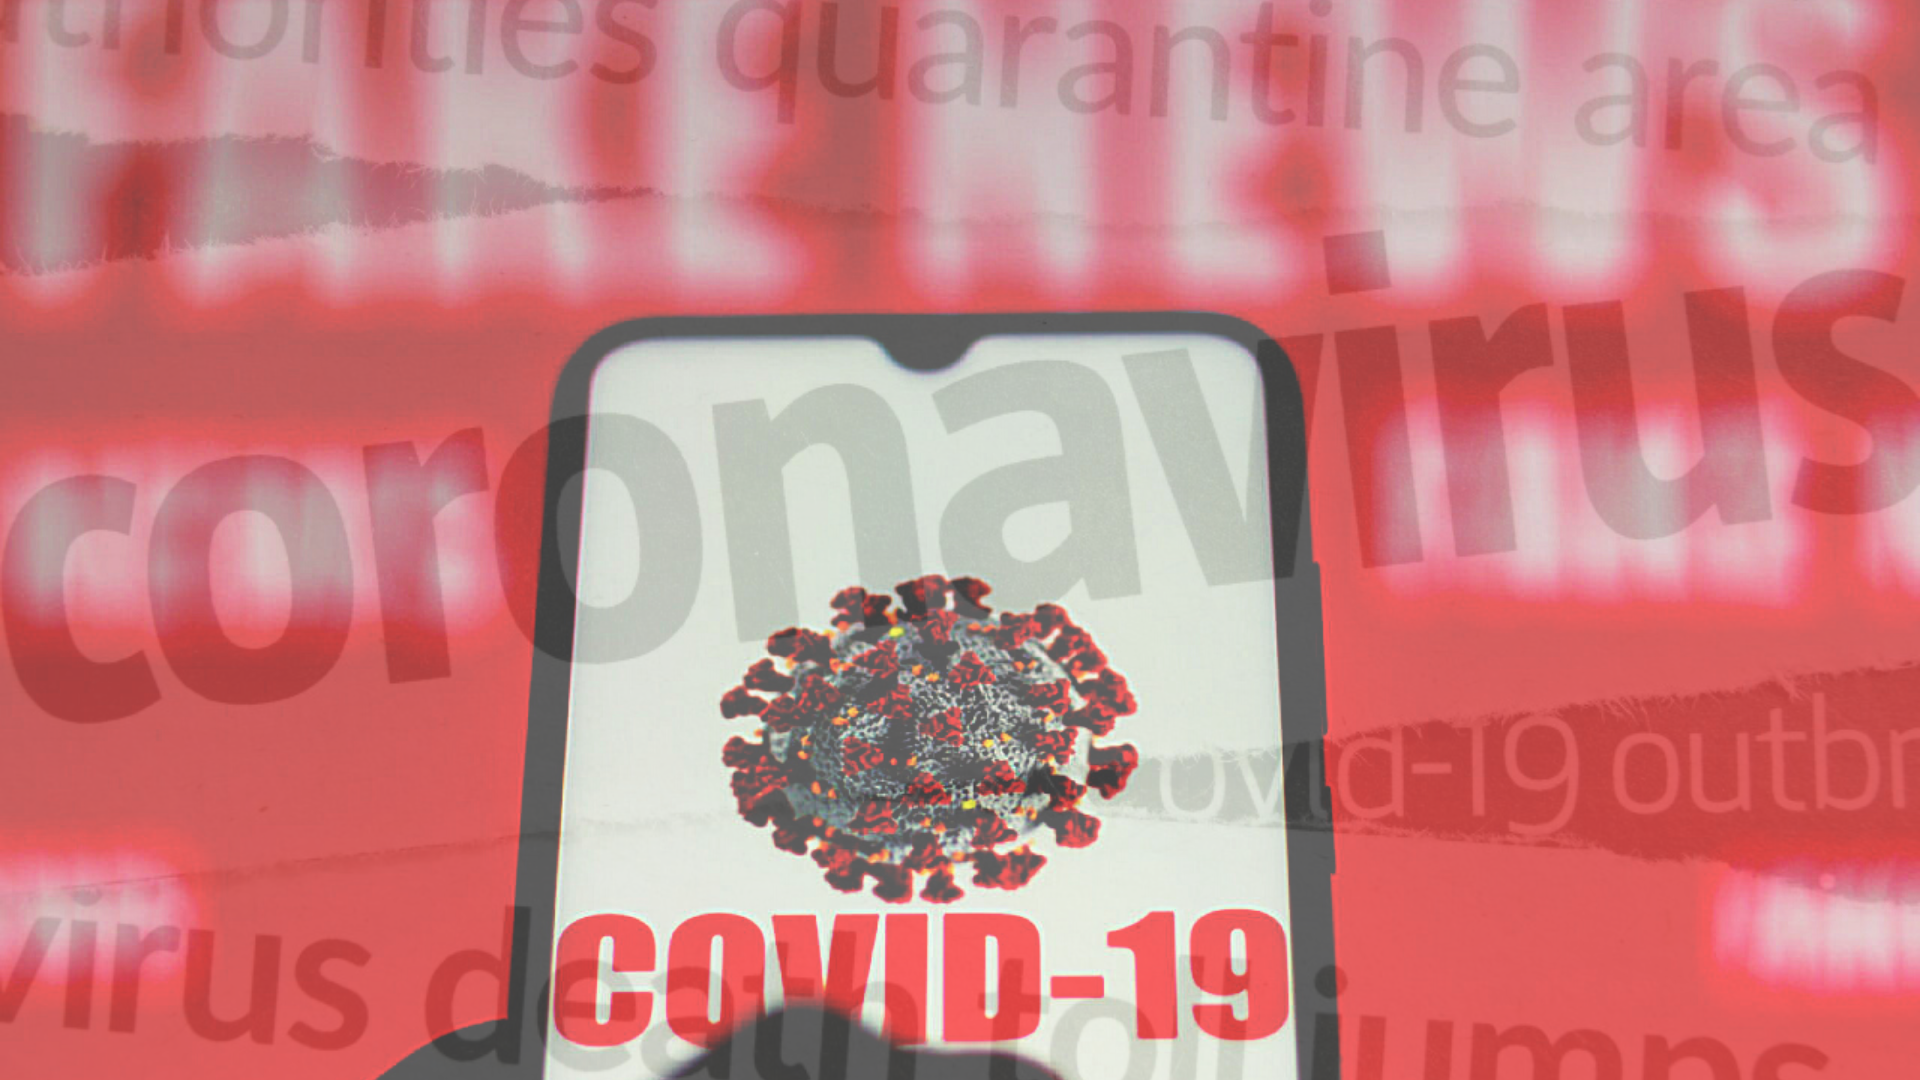 Clipping profesional ante el coronavirus